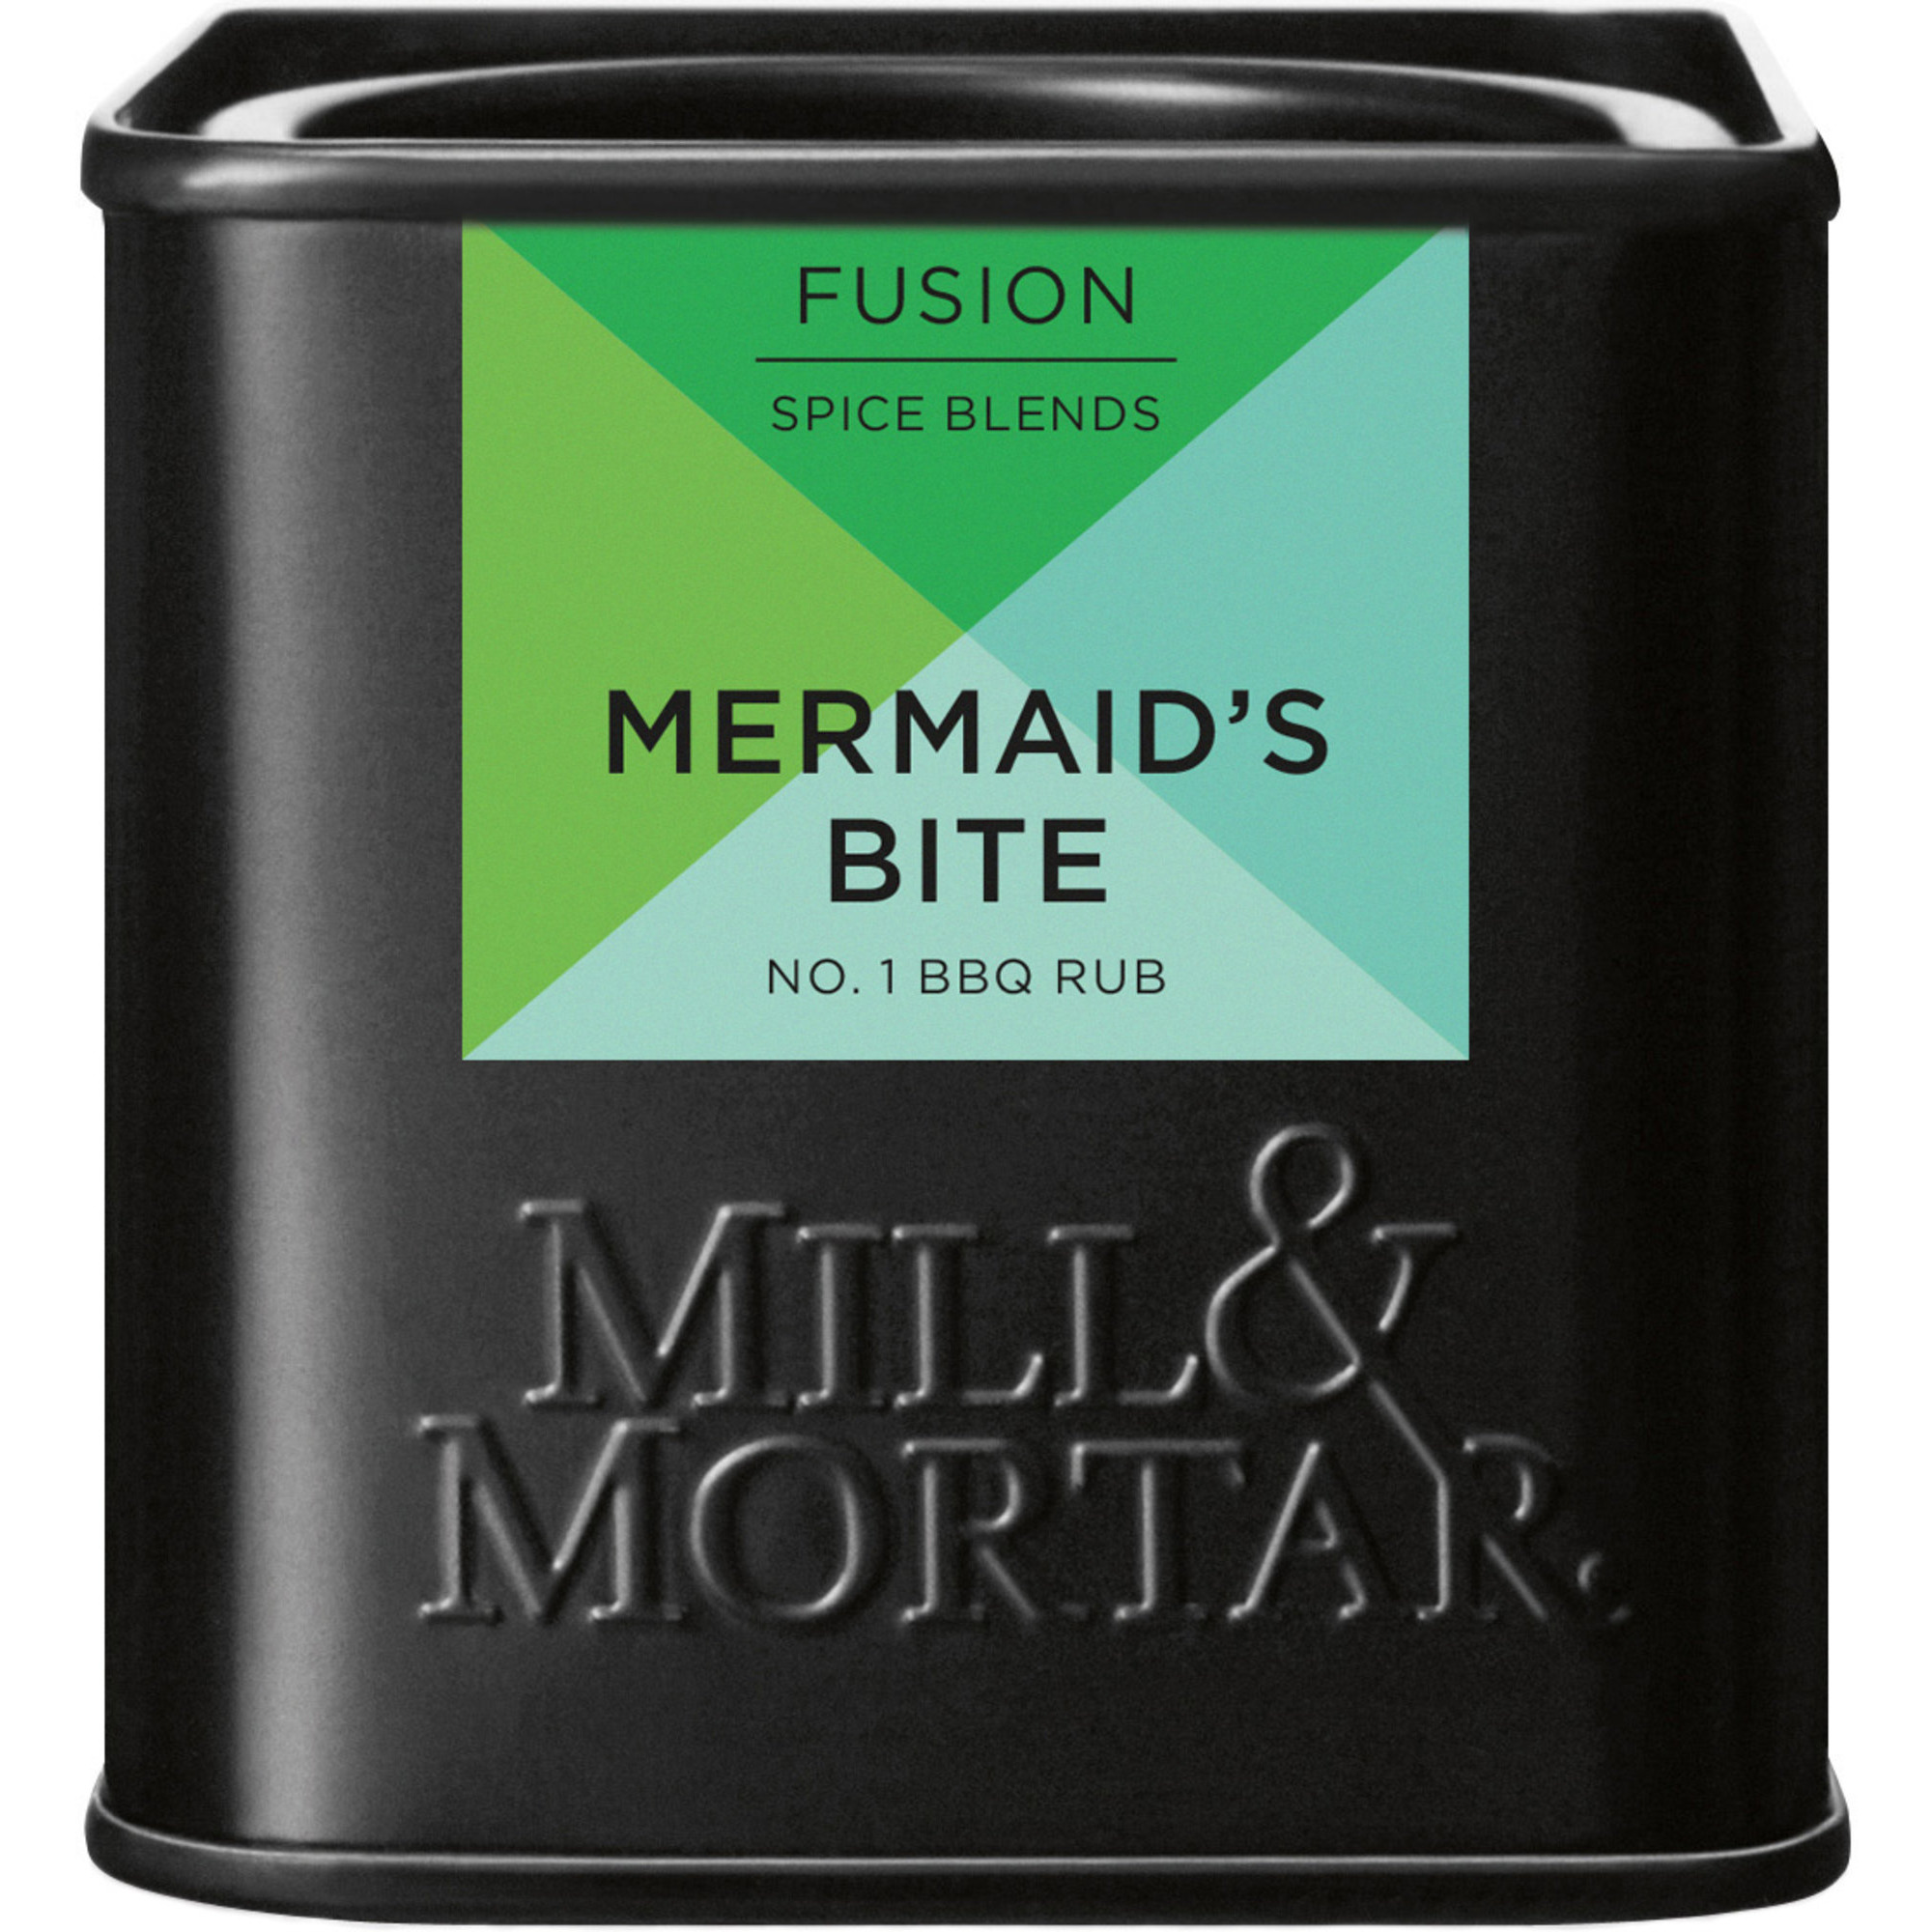 Mill & Mortar Mermaid's Bite BBQ 40 g